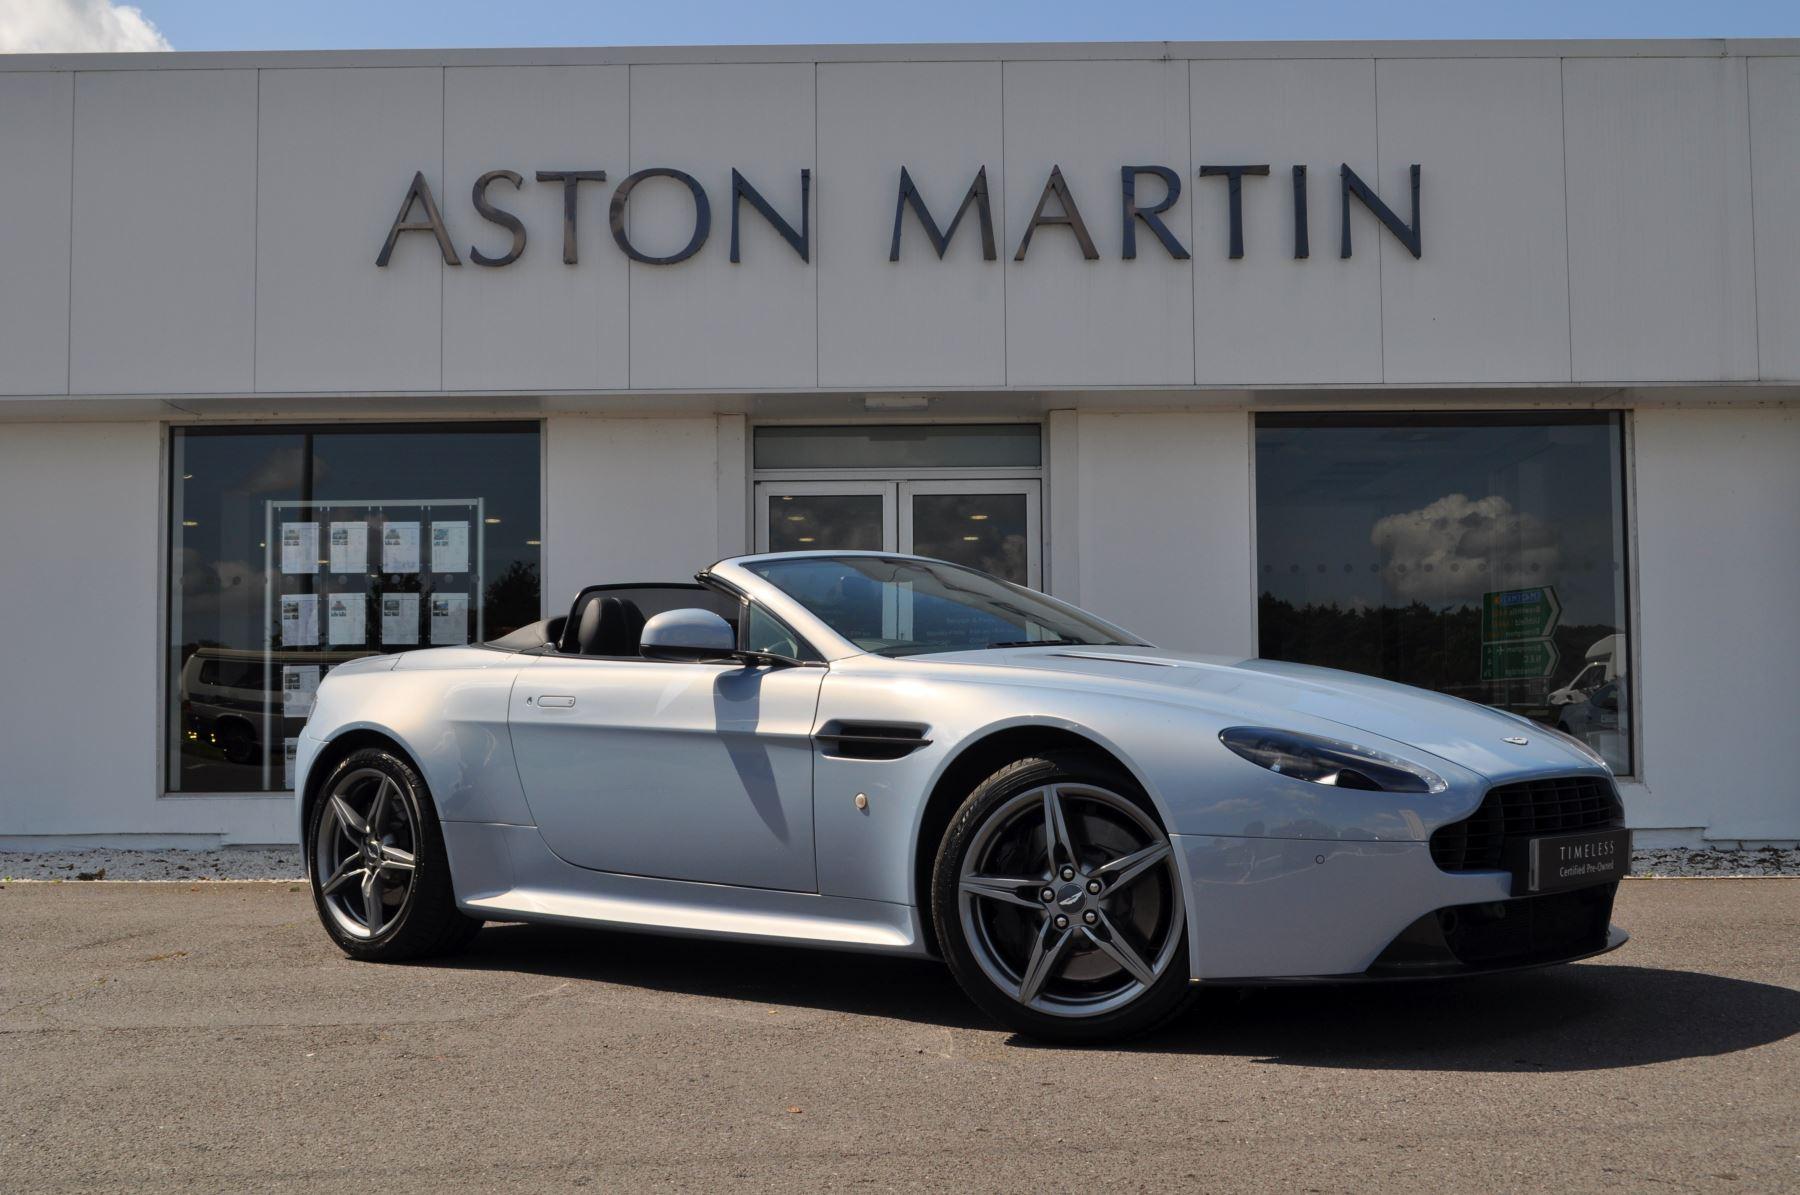 Aston Martin V8 Vantage S Roadster S 2dr Sportshift 4.7 Automatic Roadster (2017) image